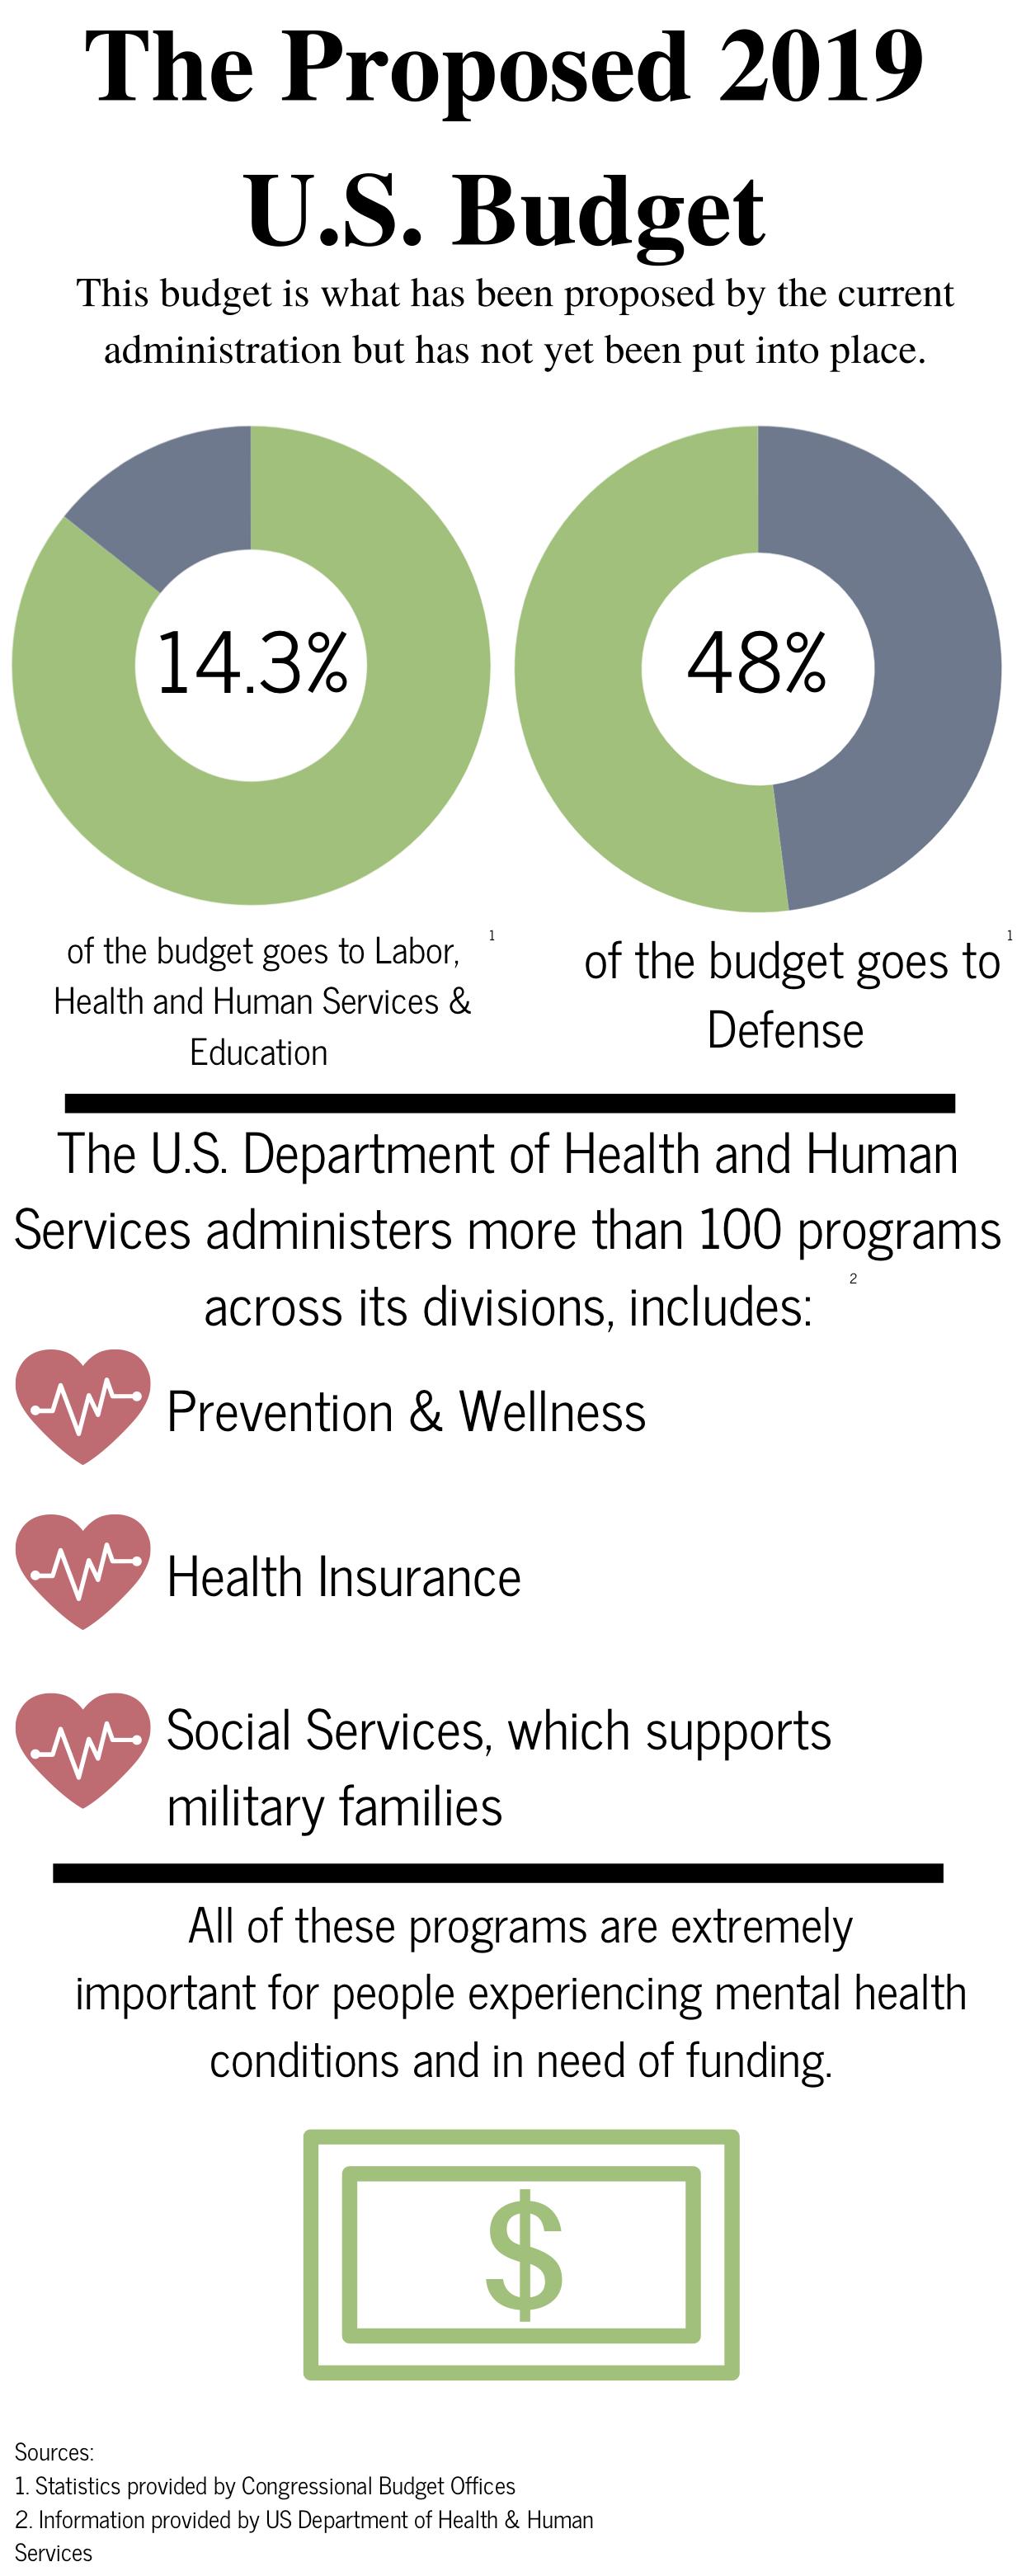 Proposed 2019 Budget (Inequities_Funding) - Laura